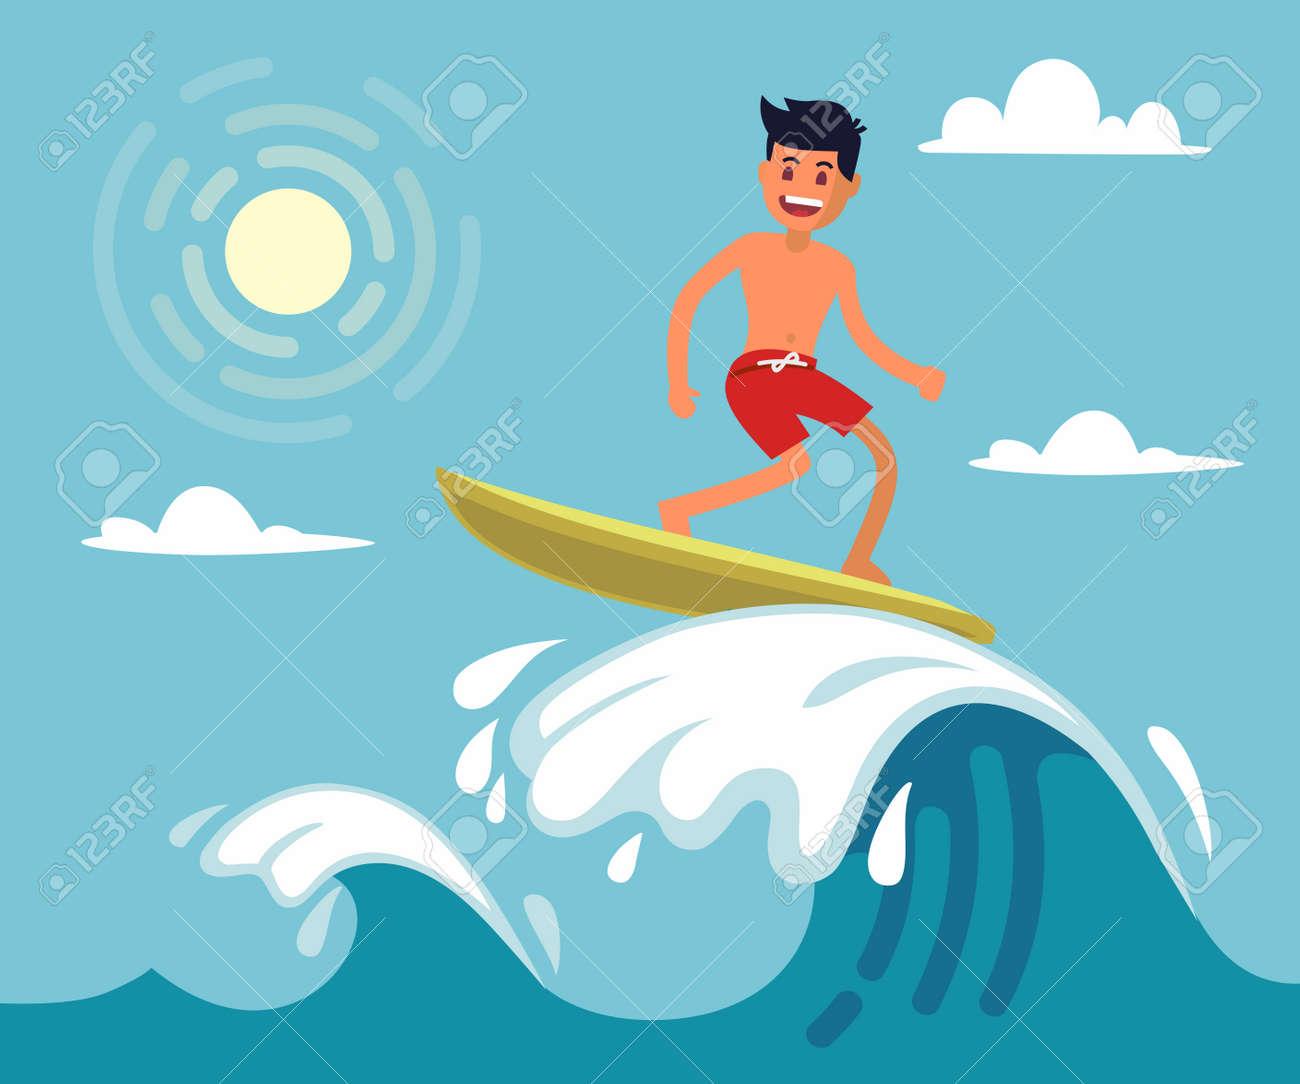 Surfer riding the wave. Vector illustration in flat stile - 87566499